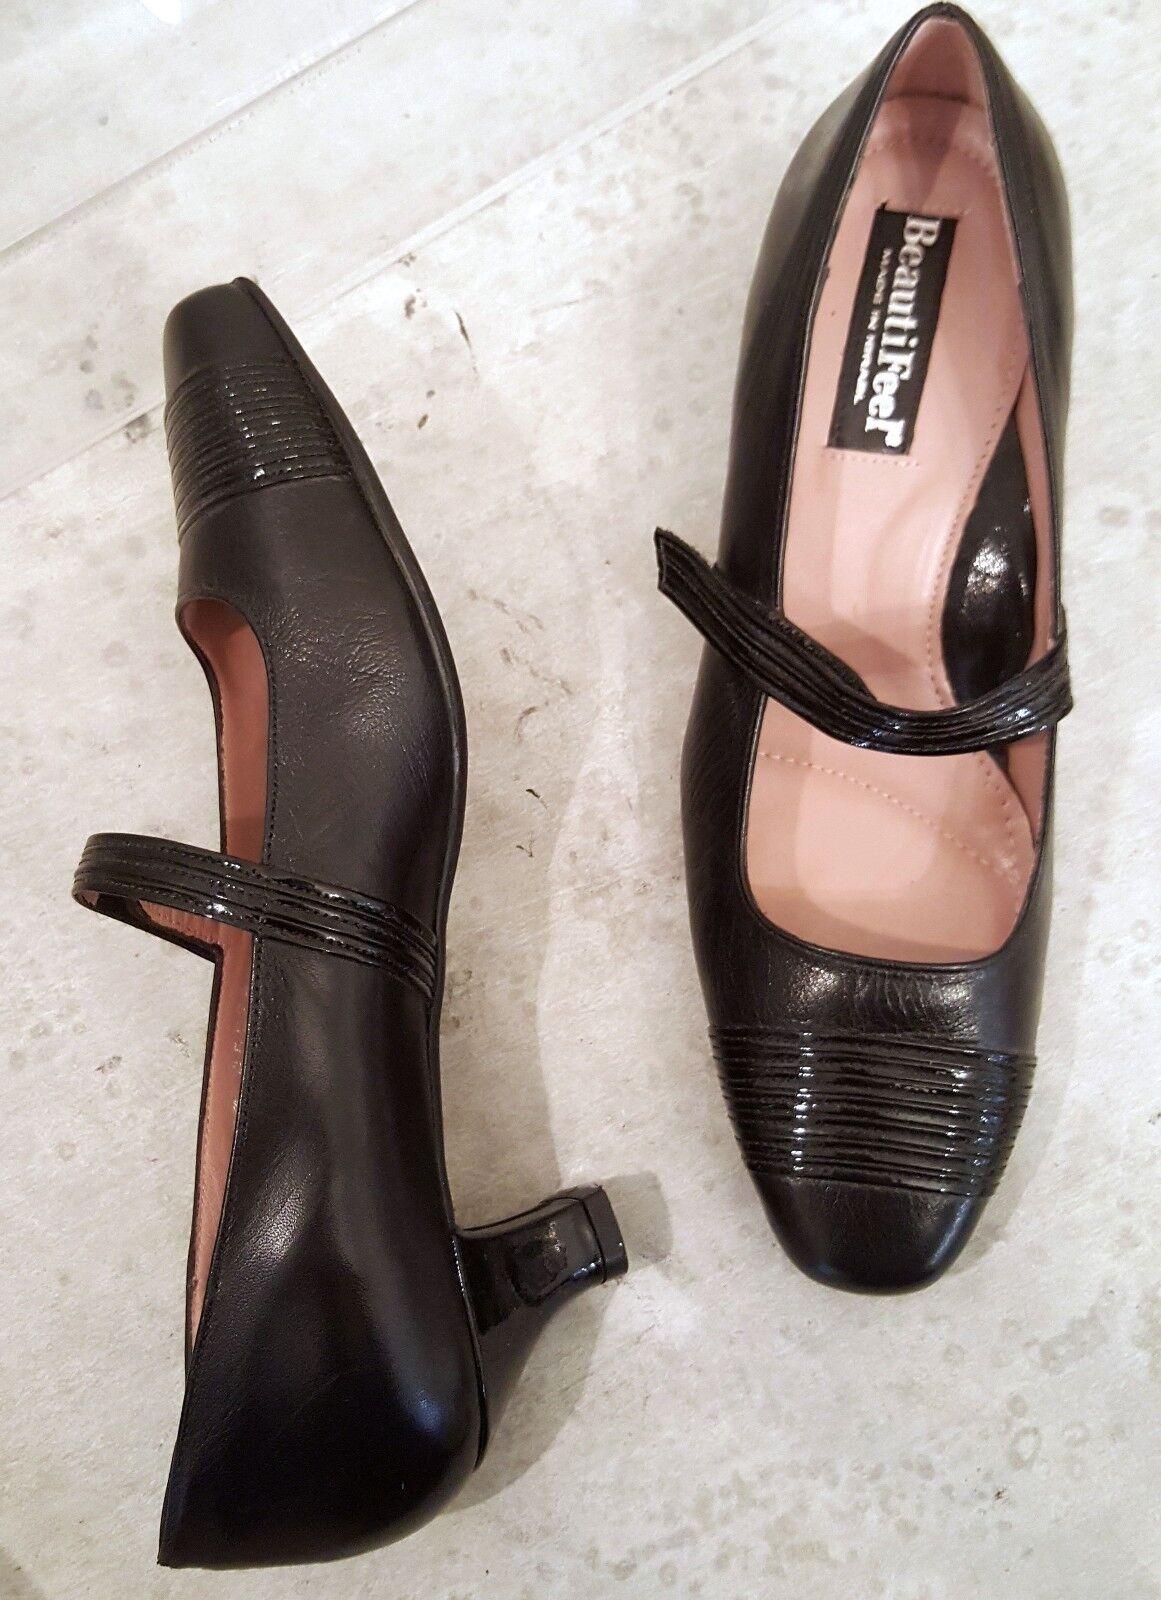 Beautifeel Lilou pumps mid heel mary jane pumps Lilou size 37 us 6.5 c88a6c